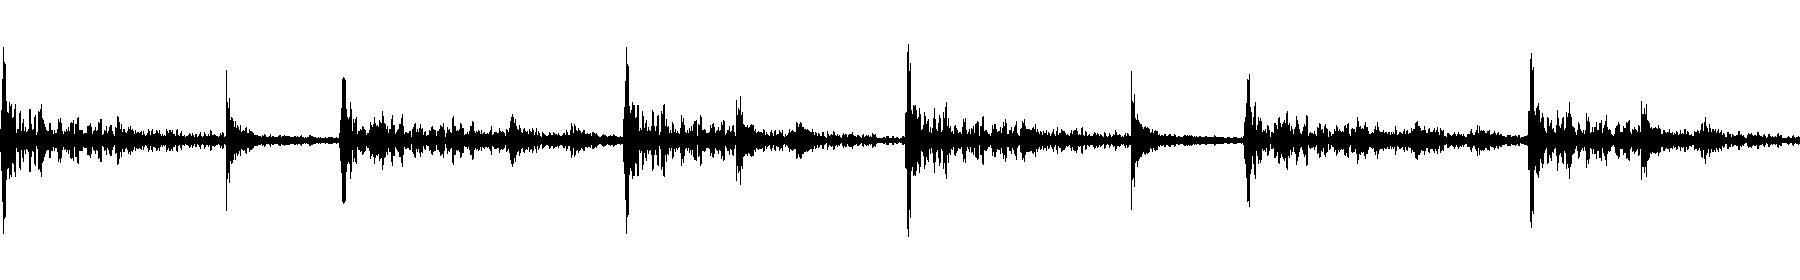 blbc jazzydrums 130 01